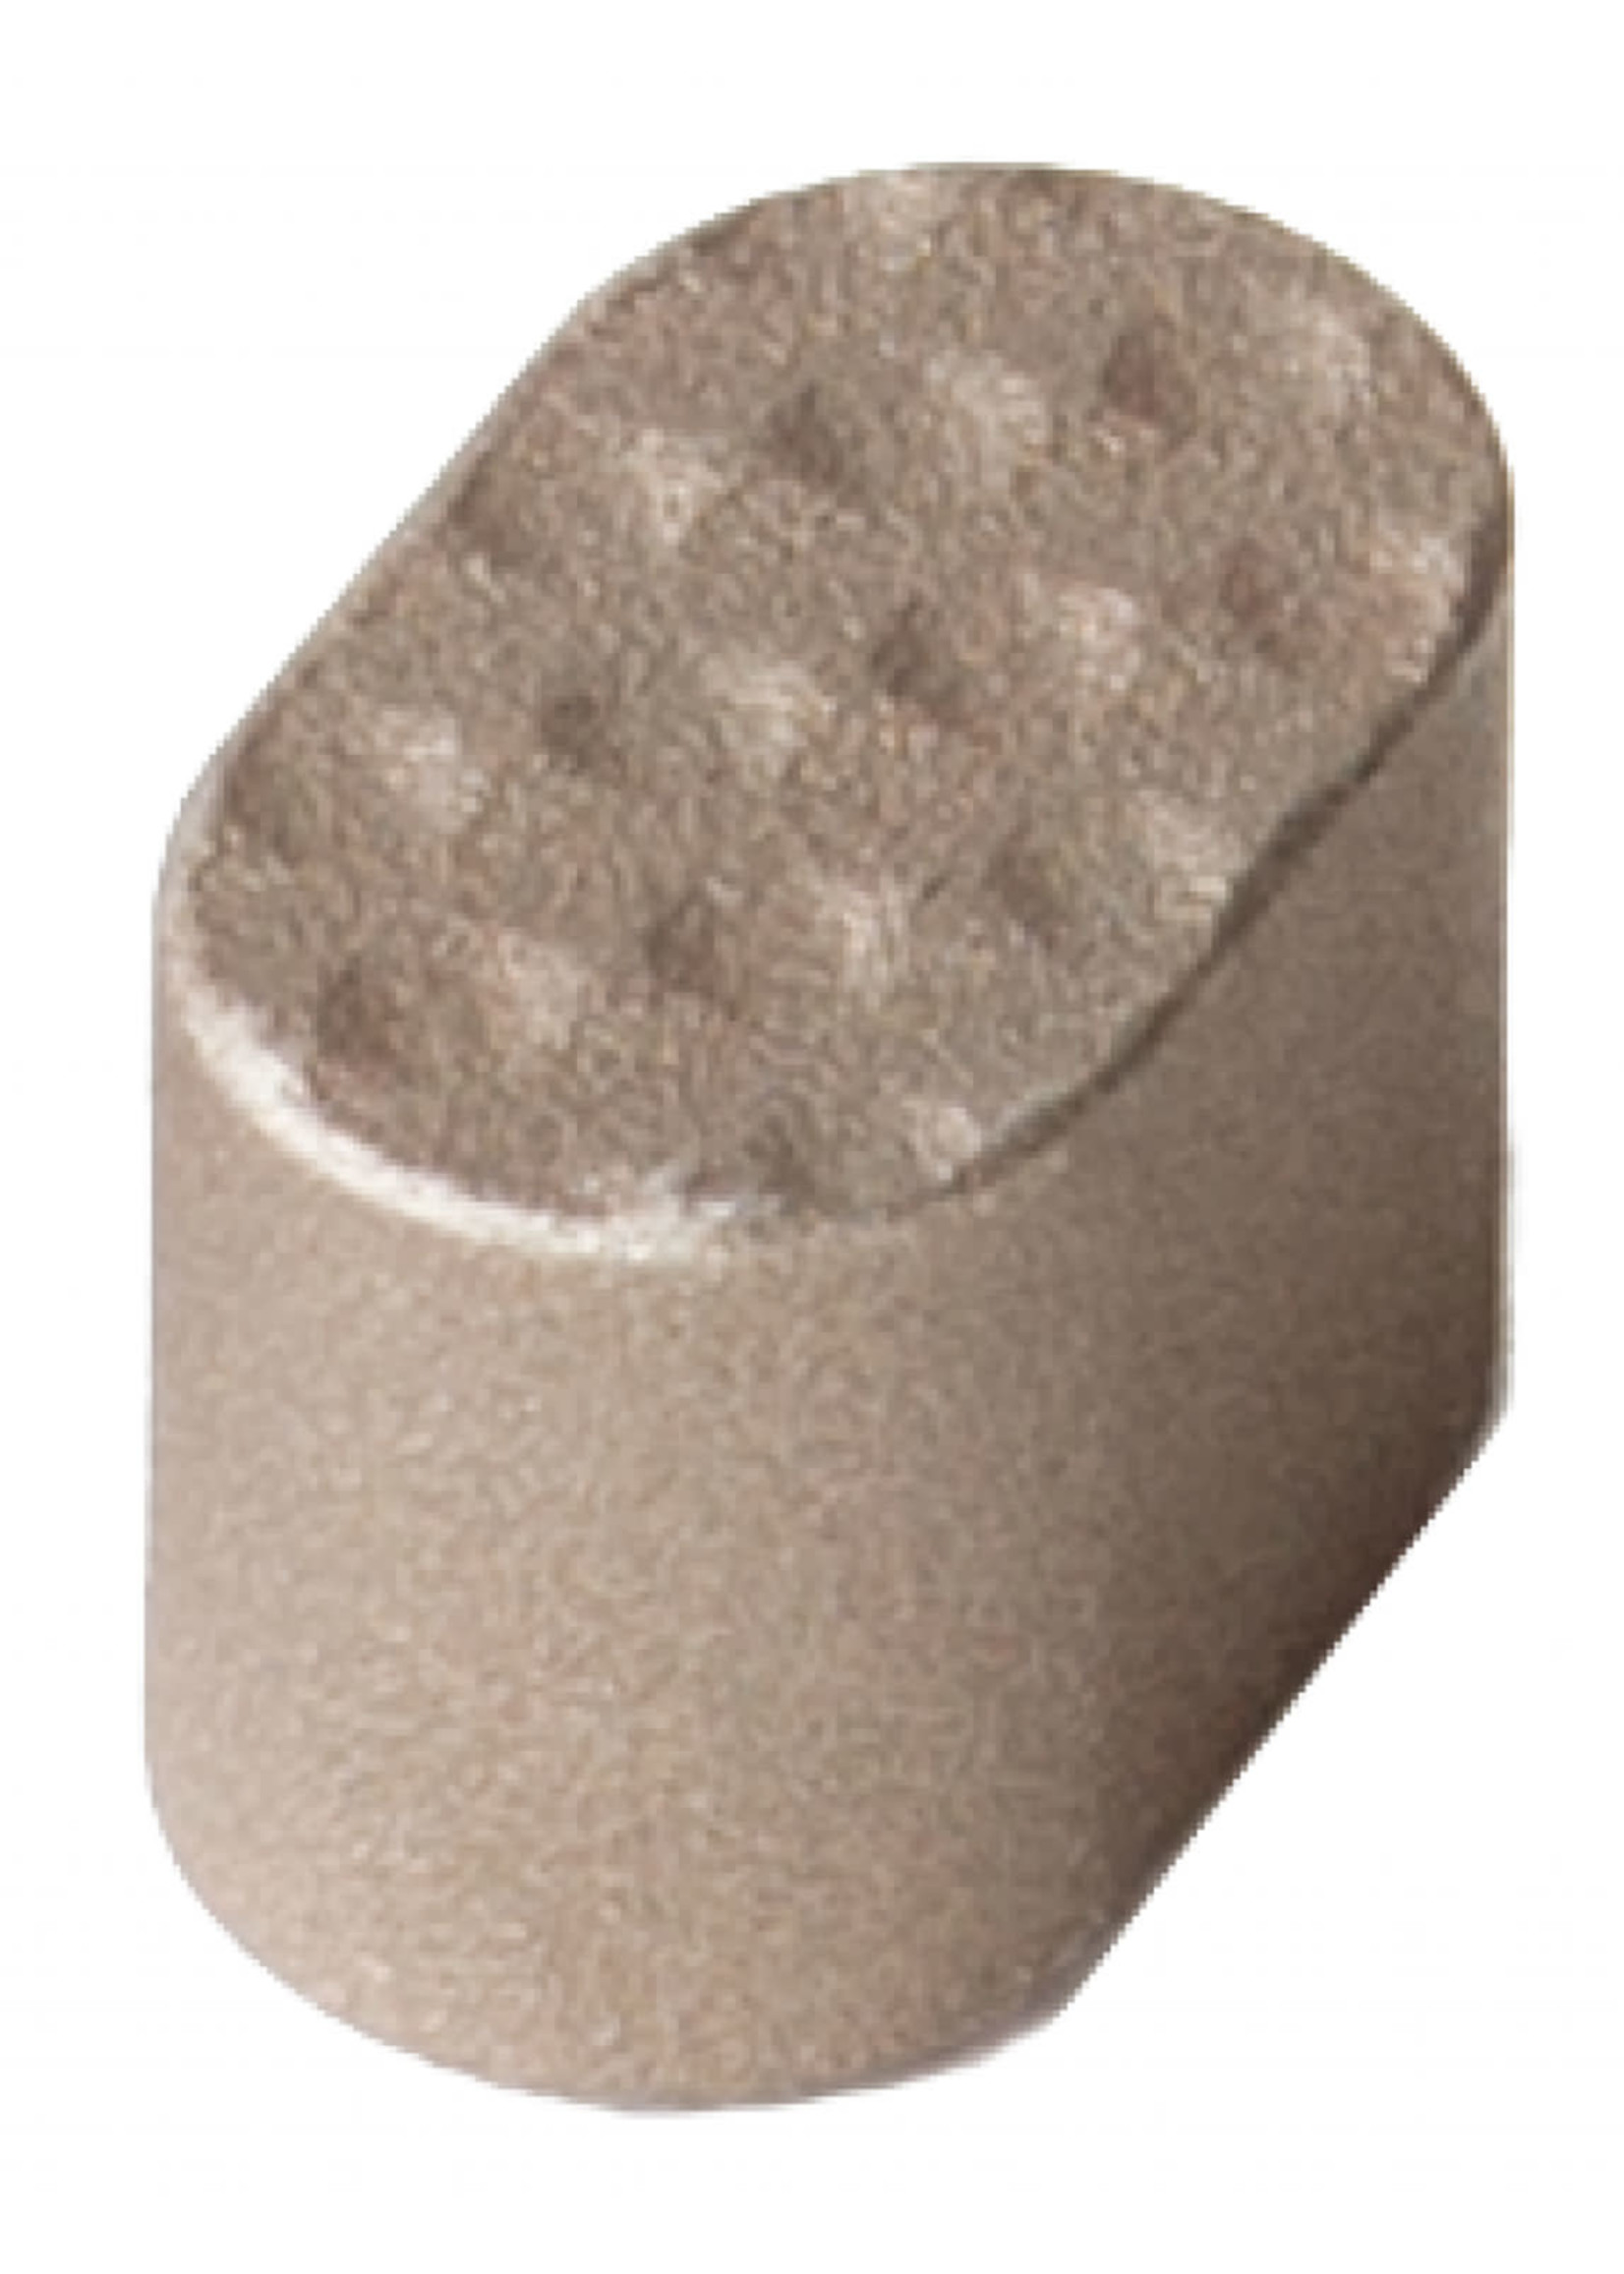 Seekins Precision Seekins Precision Billet Mag Release AR-Platform FDE Anodized 6061-T6 Aluminum